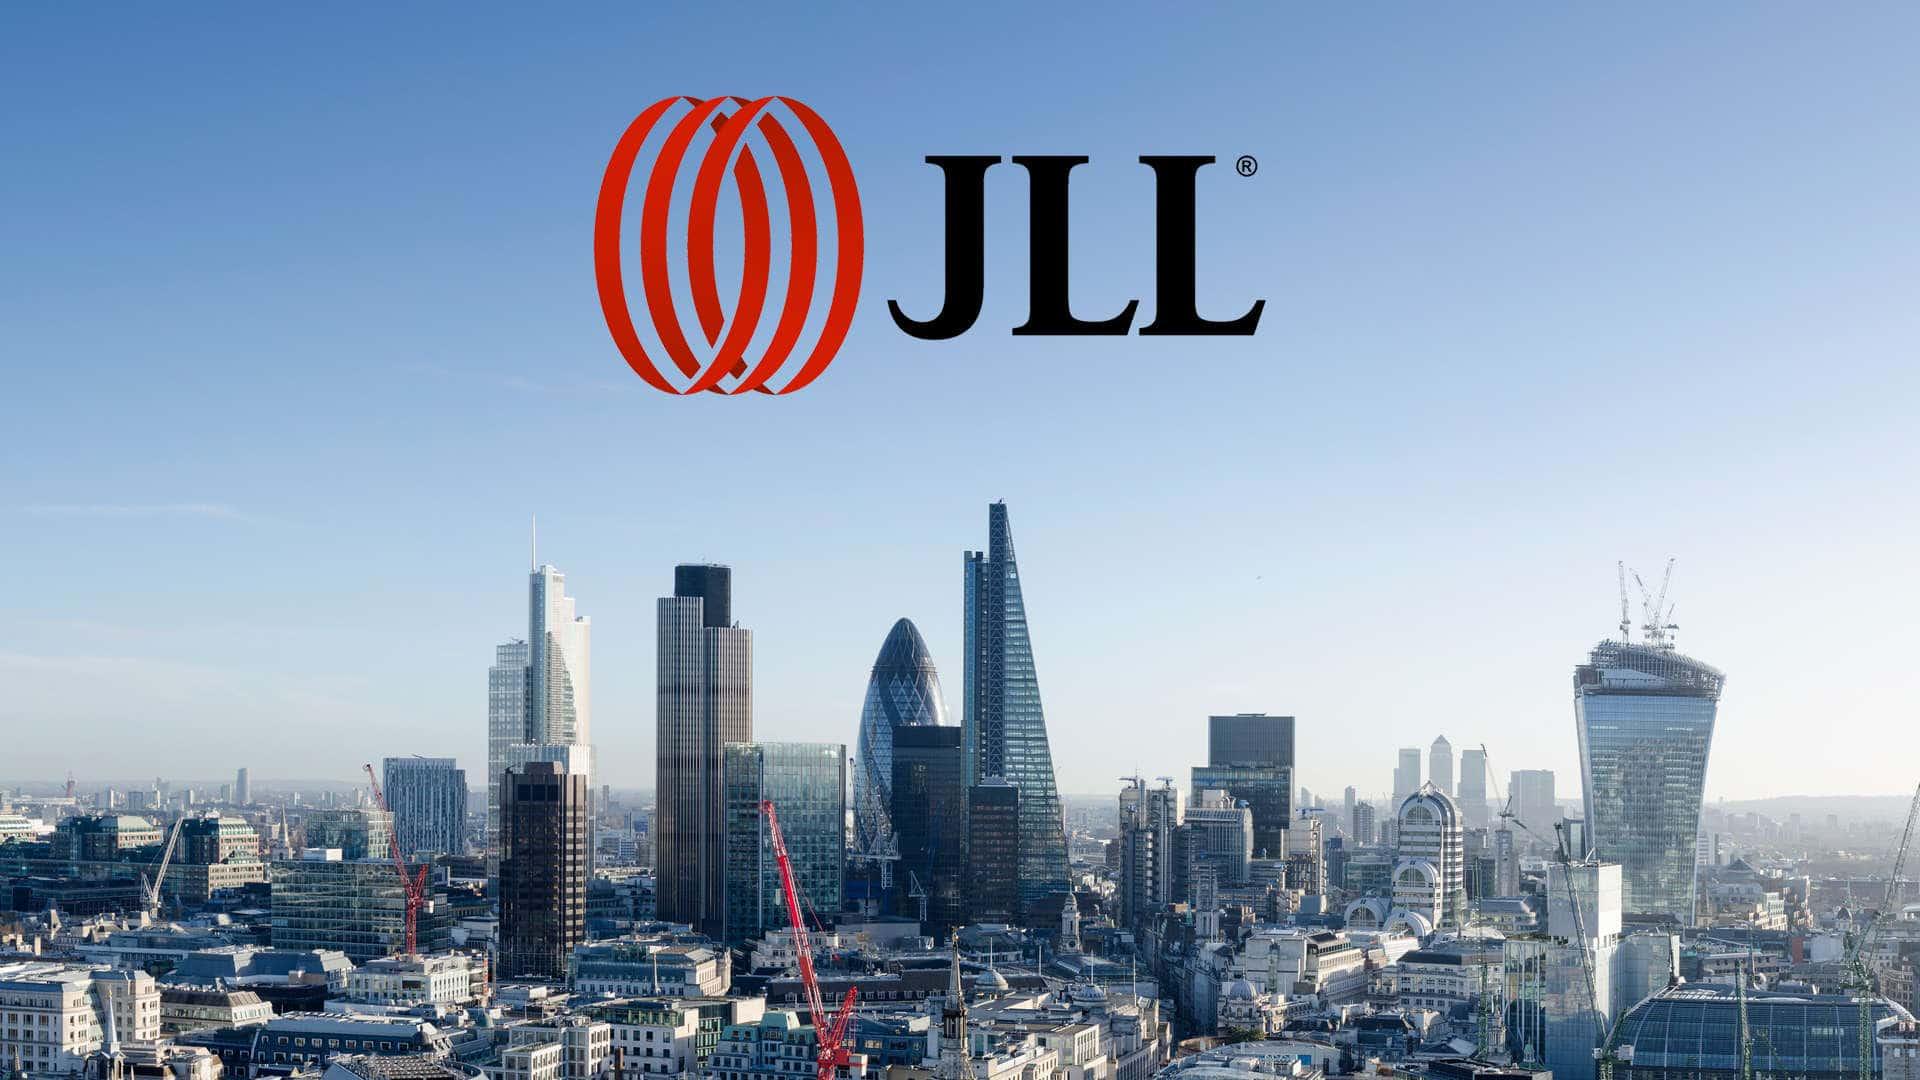 JLL-London-is-the-Top-'Established-World-City%u2019